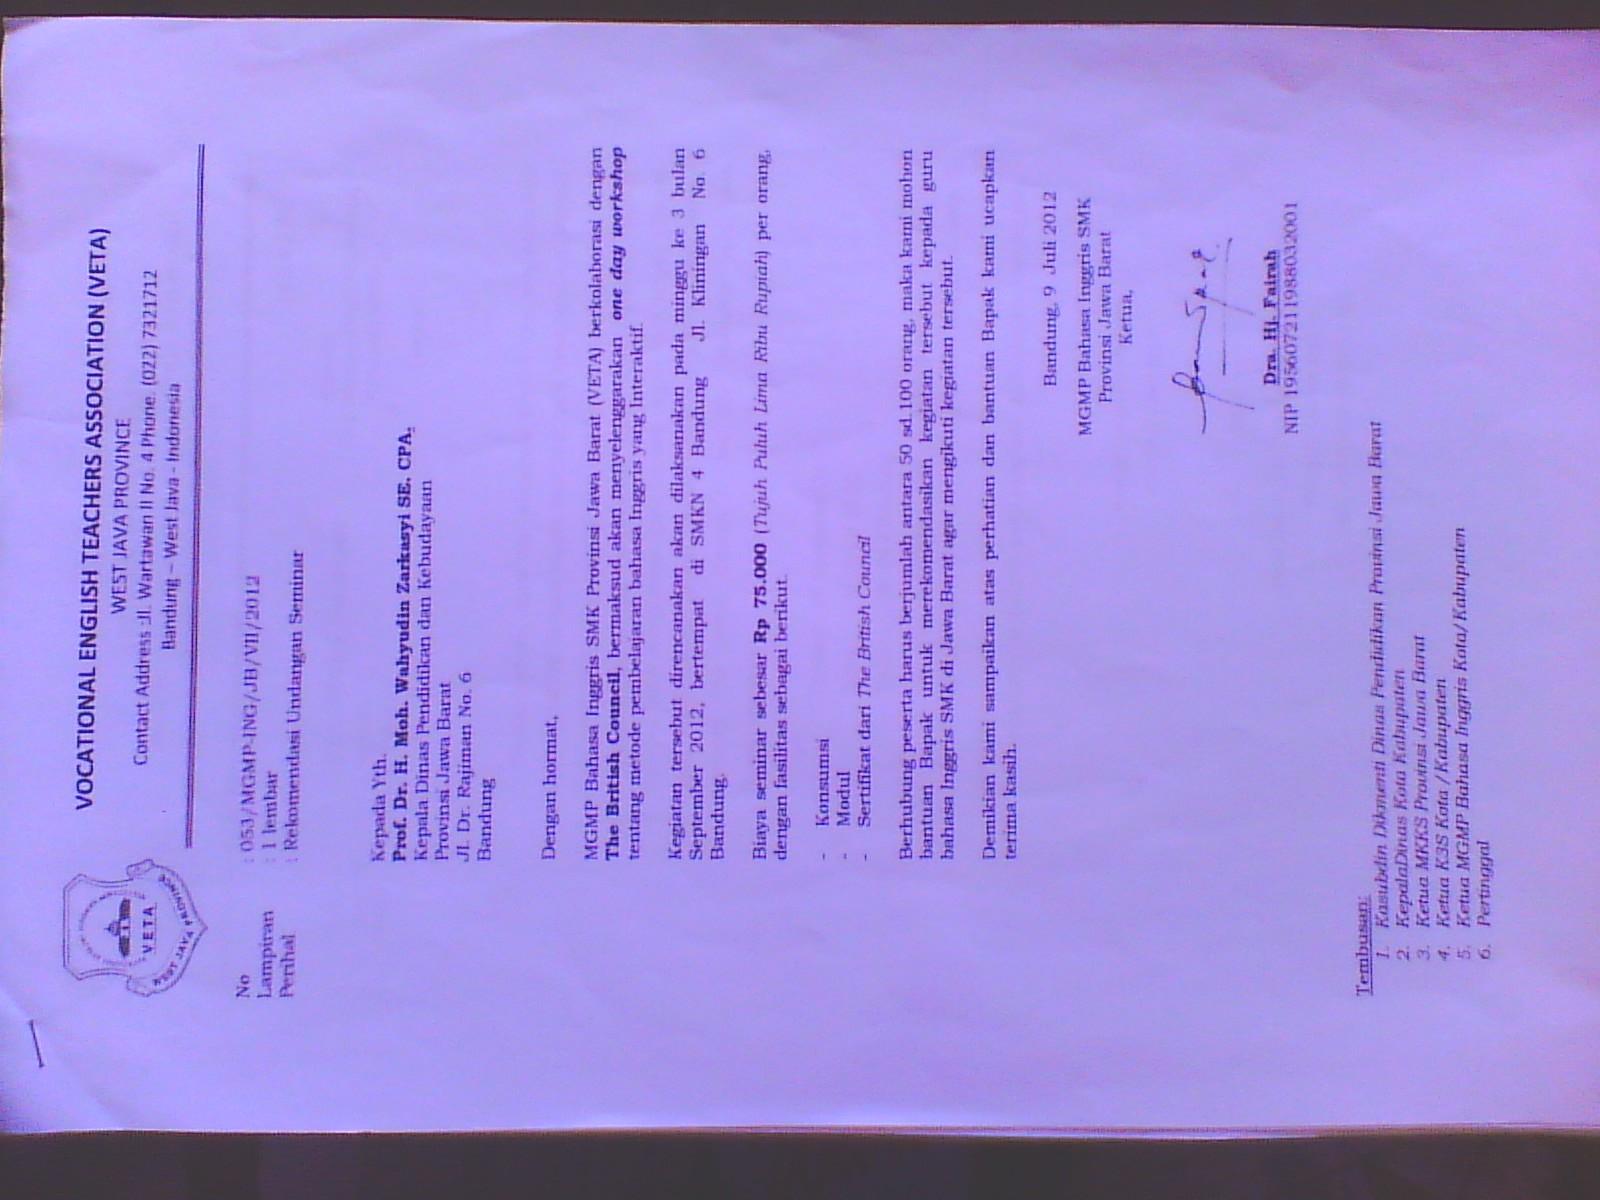 contoh laporan kegiatan mgmp bahasa inggris